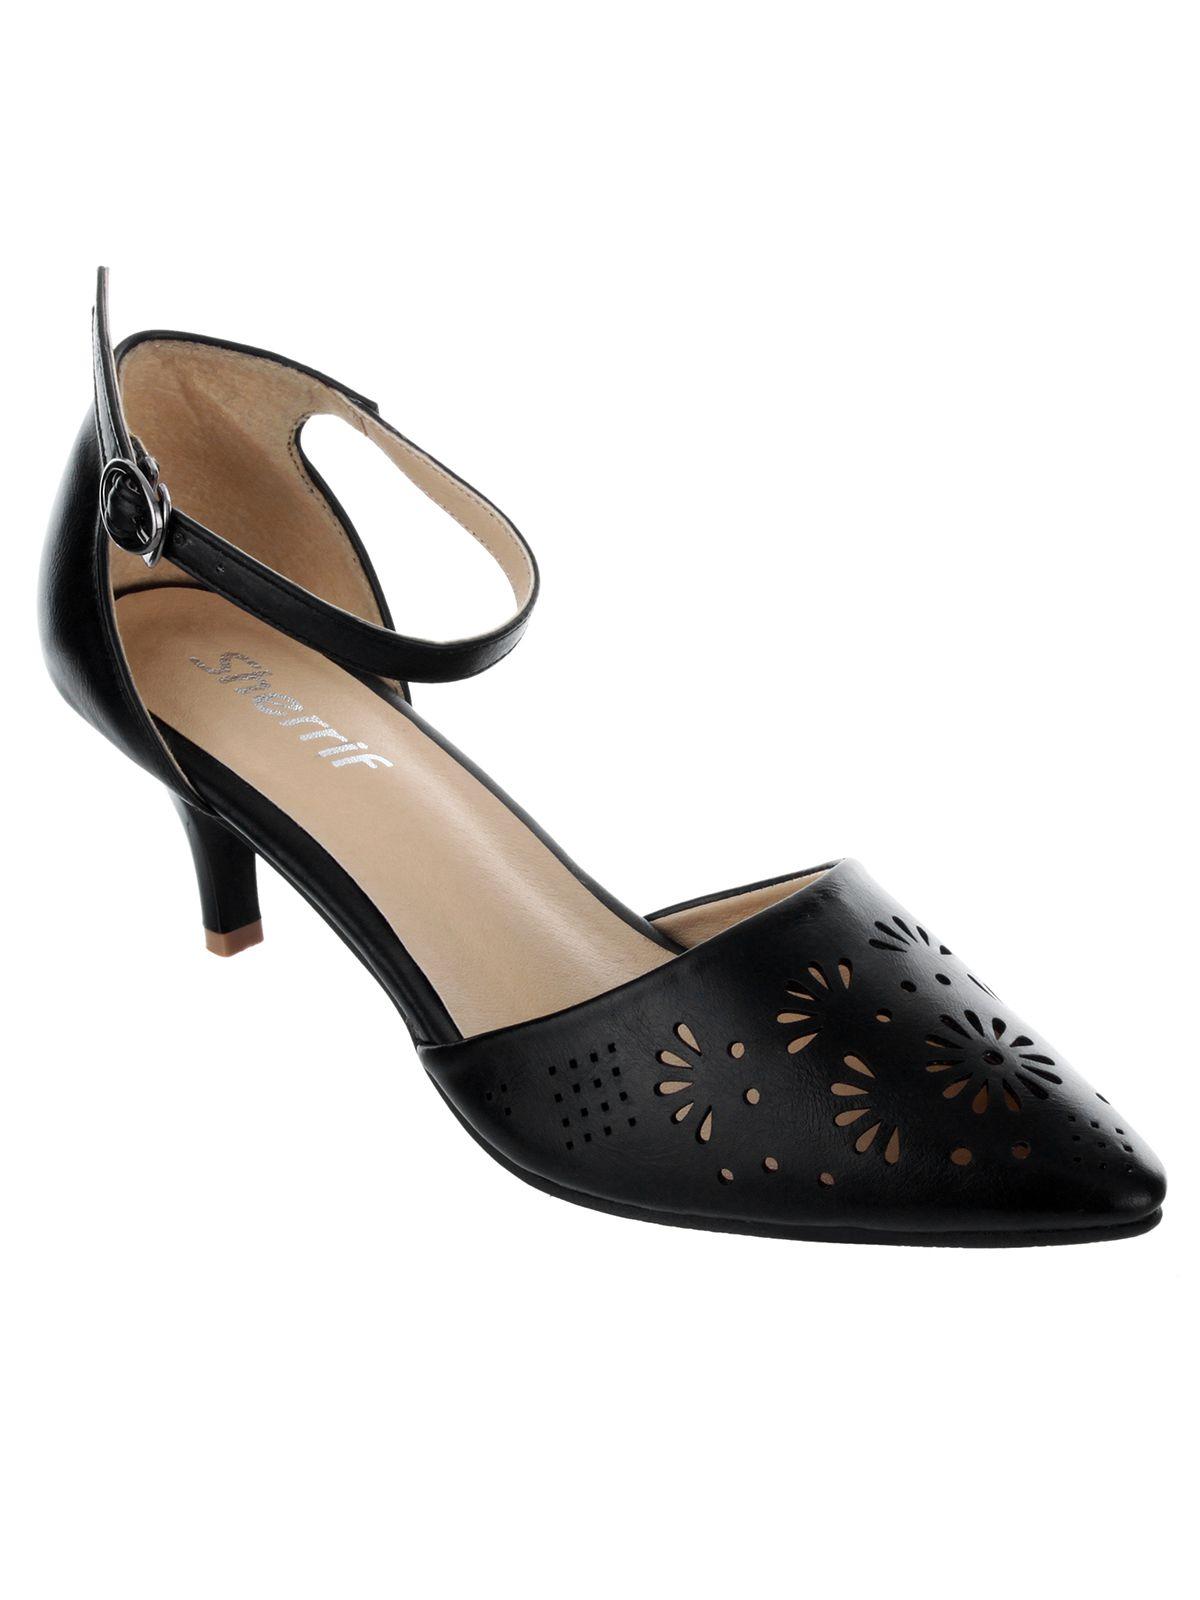 bc8083ab6db Sherrif Shoes Black Kitten Heels Price in India- Buy Sherrif Shoes Black Kitten  Heels Online at Snapdeal